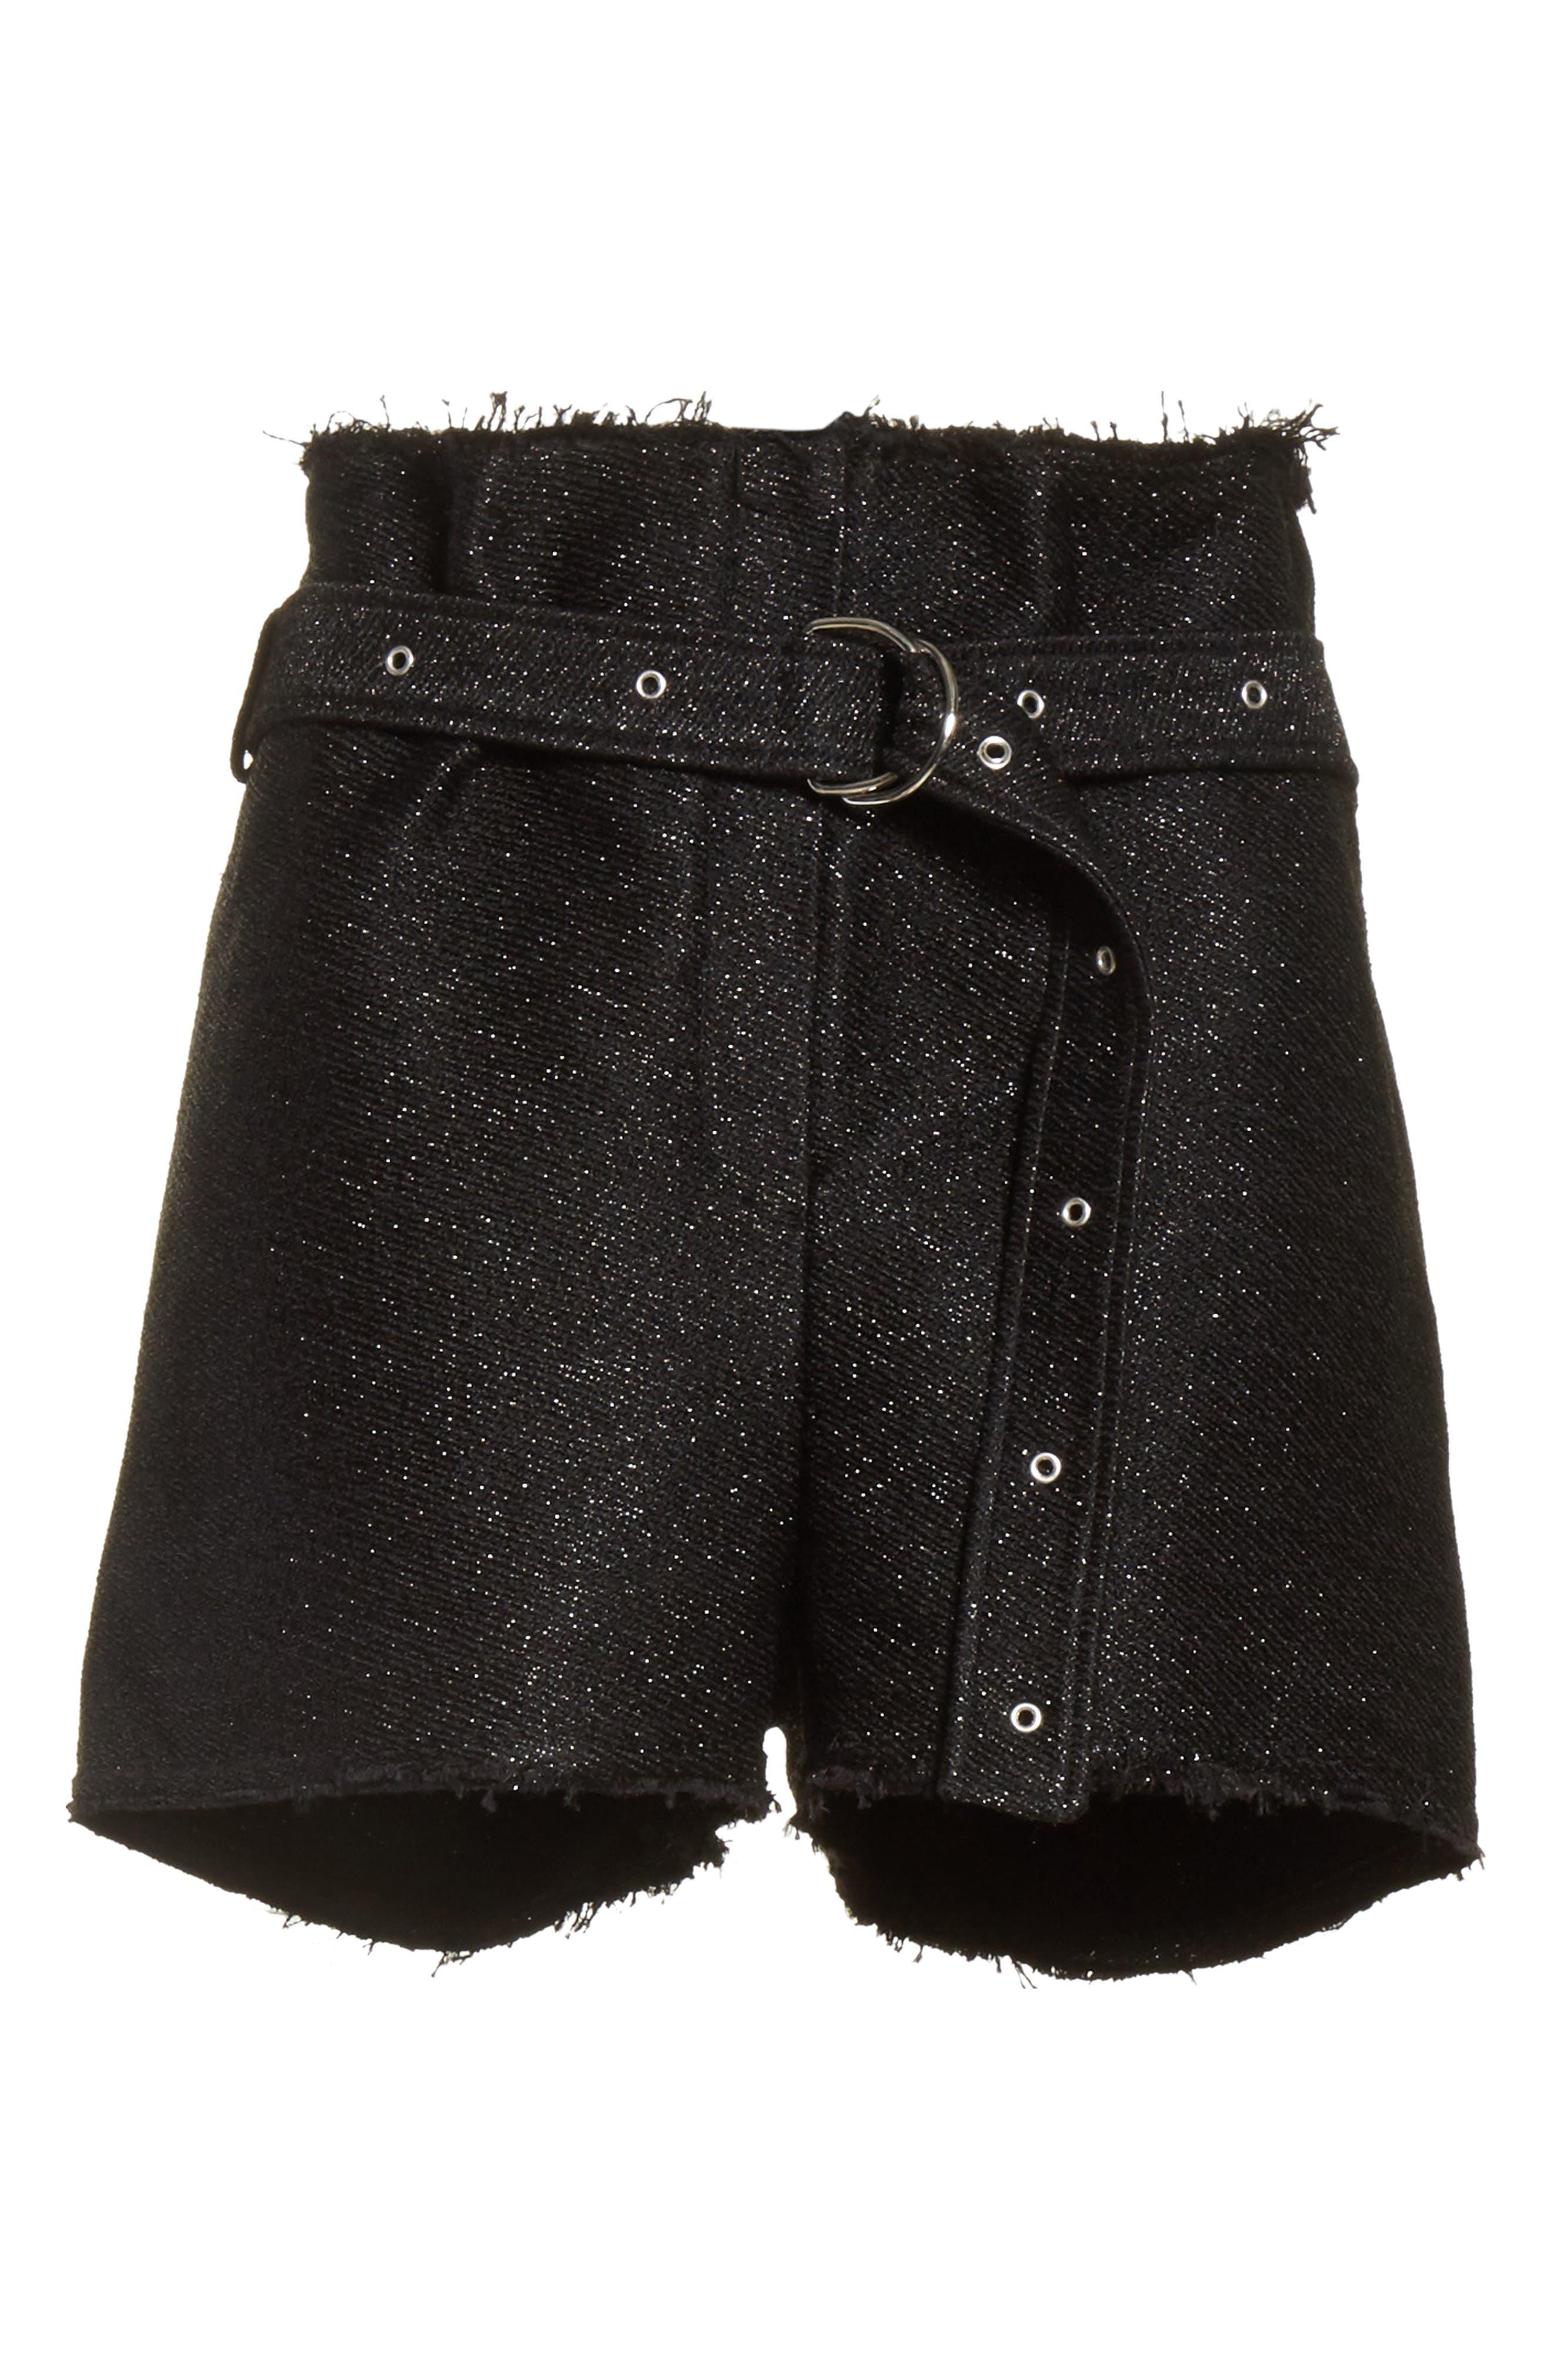 Chopan Belted Paper Bag Shorts,                             Alternate thumbnail 6, color,                             Black